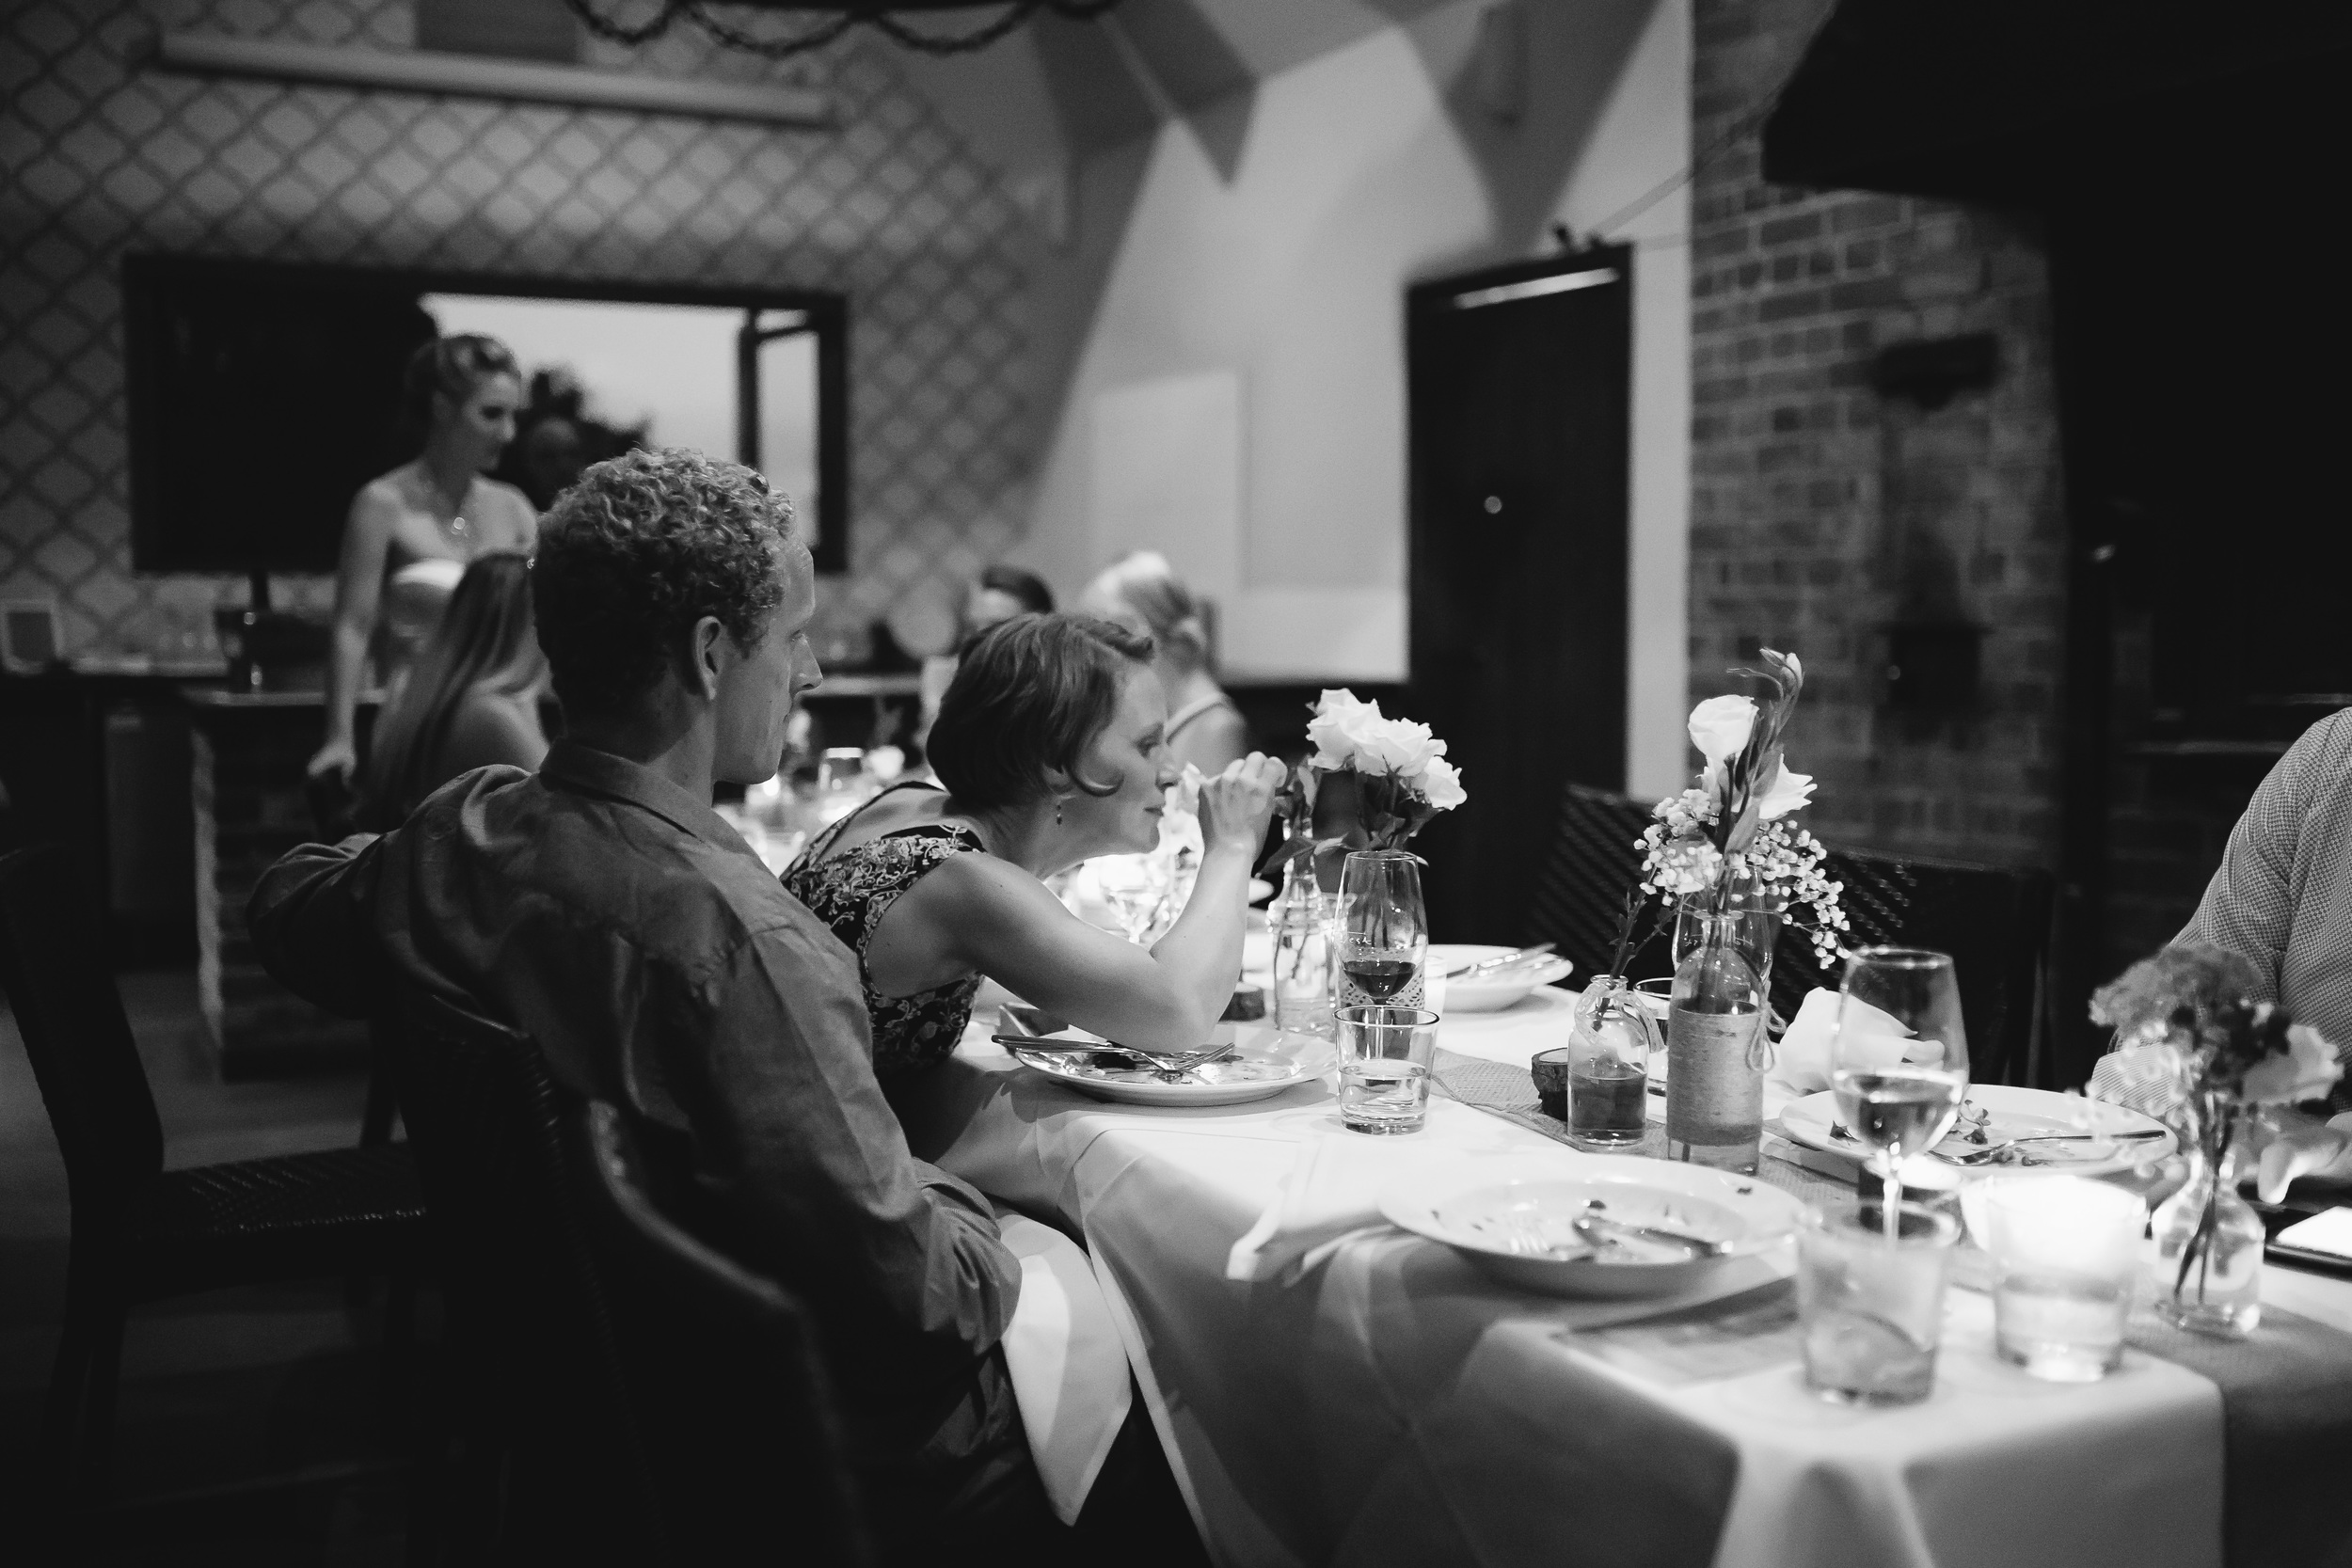 Byron Bay Wedding Harvest Cafe - Carly Tia Photography 041.jpg